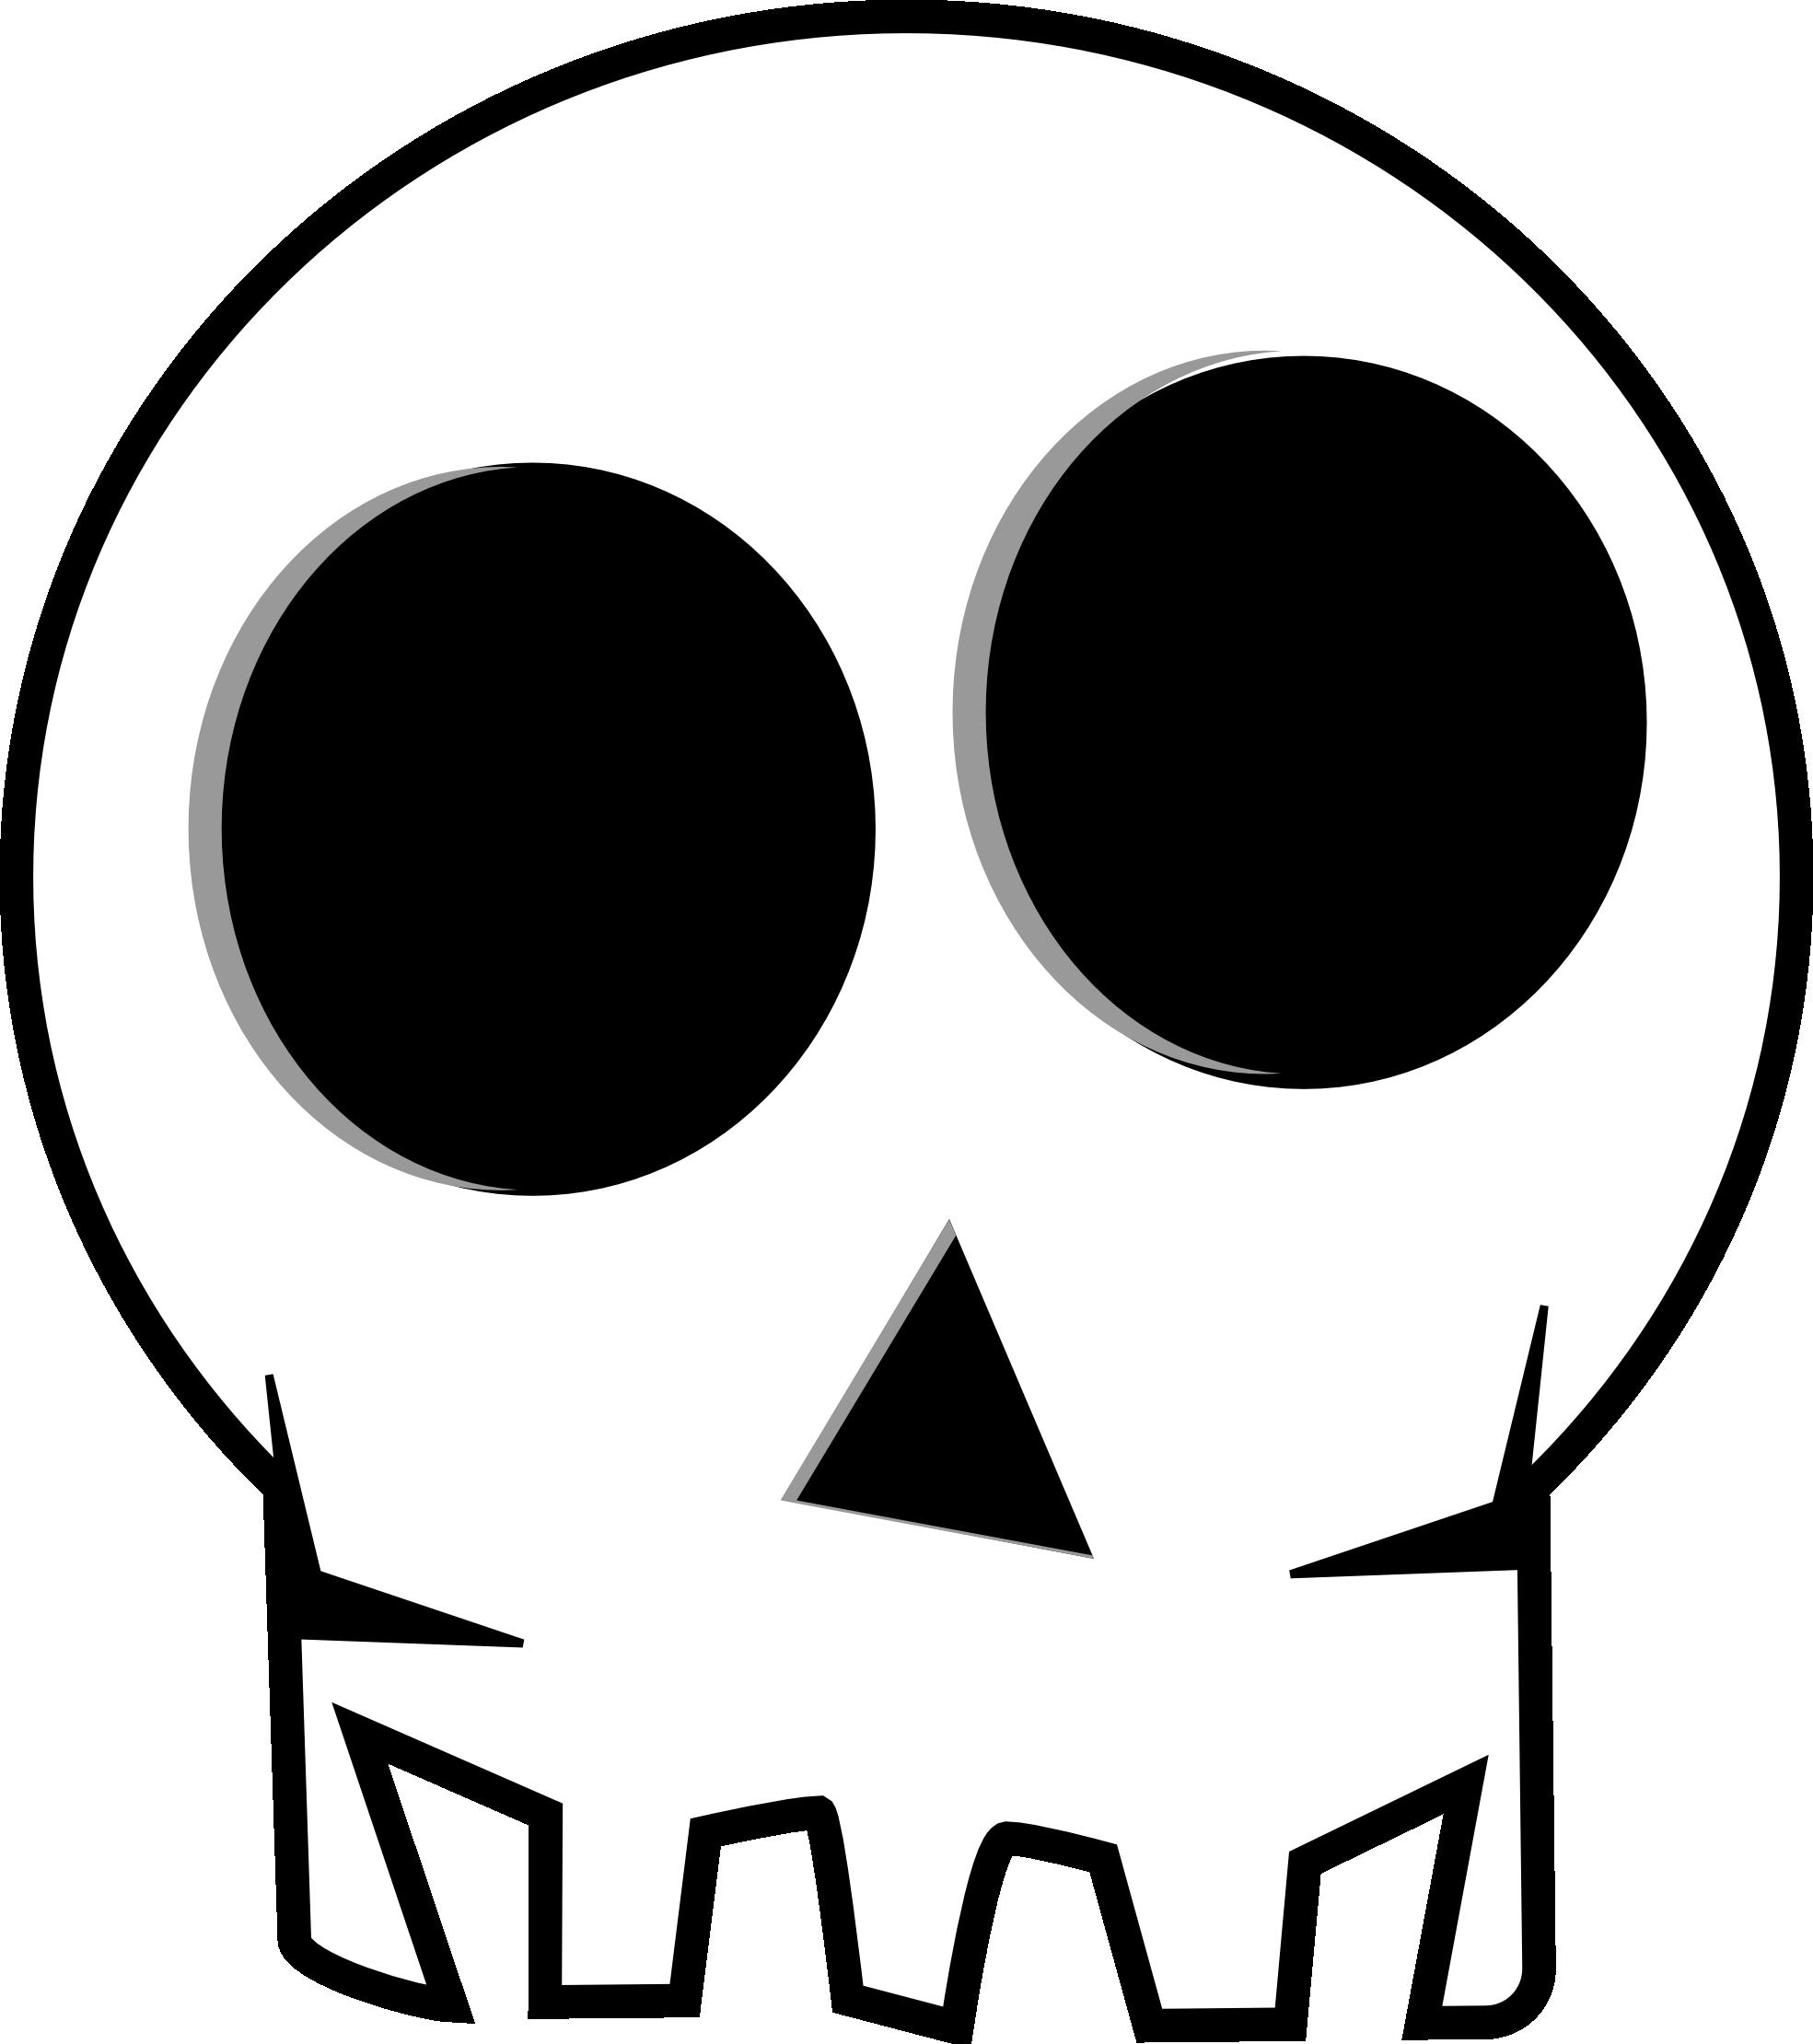 Sleleton clipart coloring page Clip The Skull Skull Art